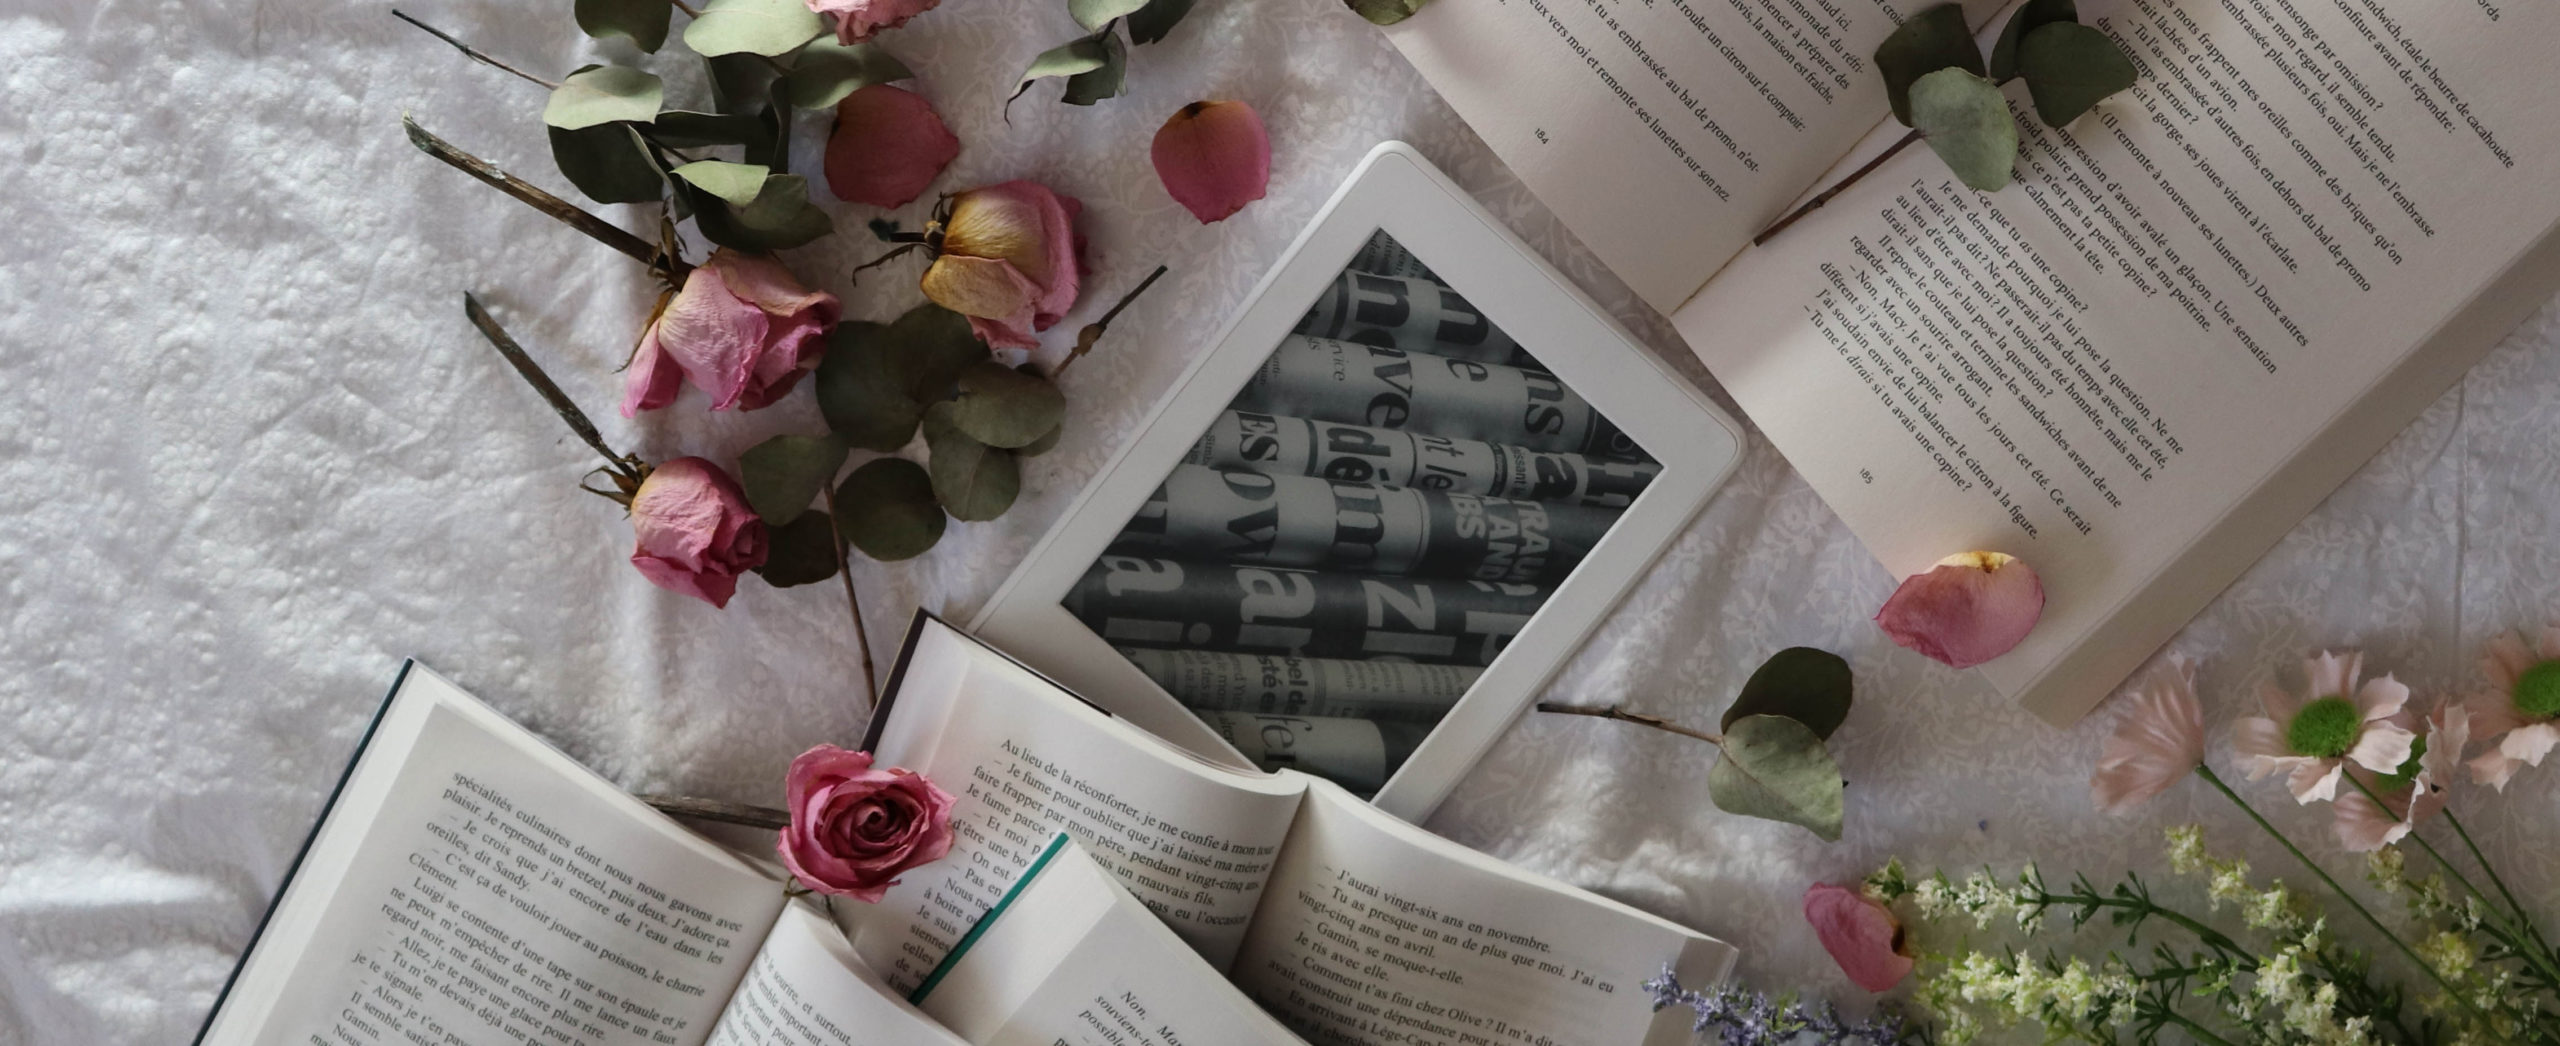 livres, liseuses, roses